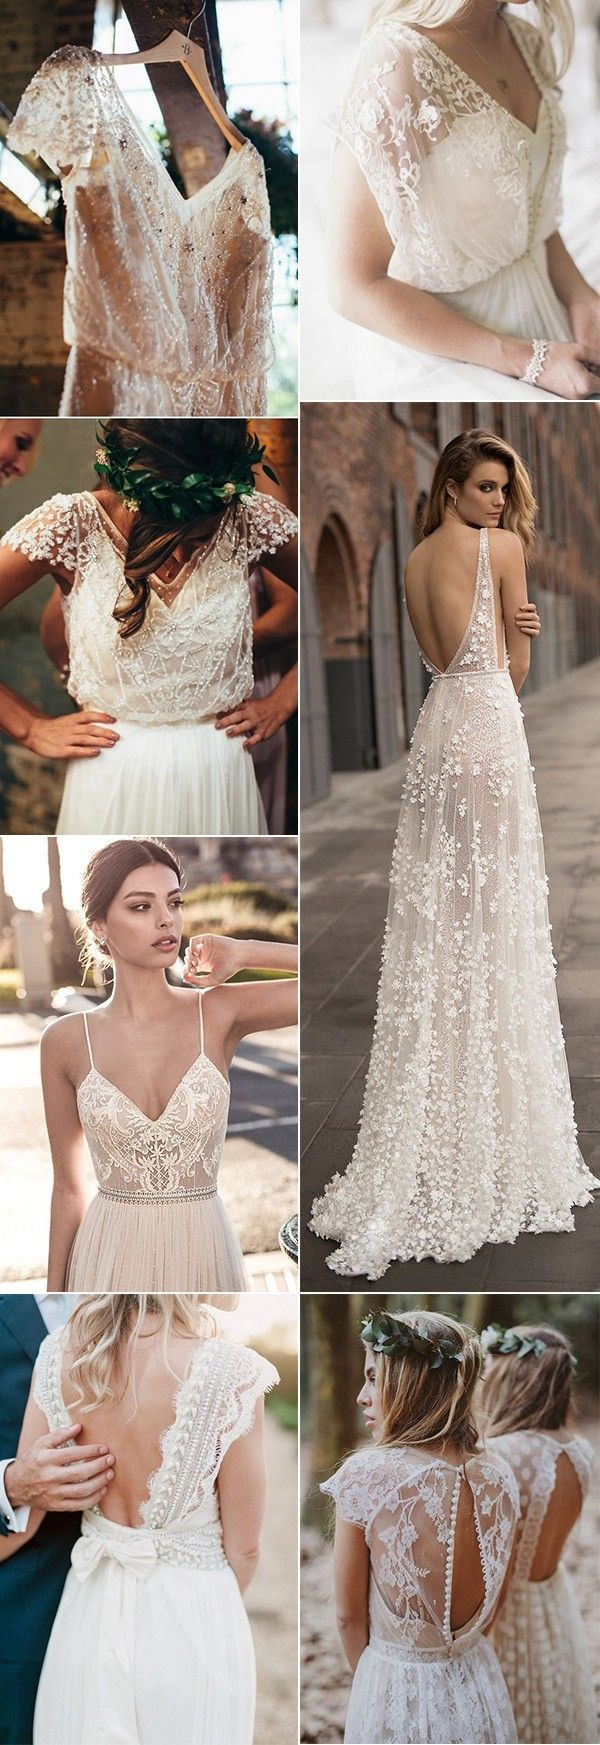 Trending boho wedding dresses for weddingdresses weddingdress